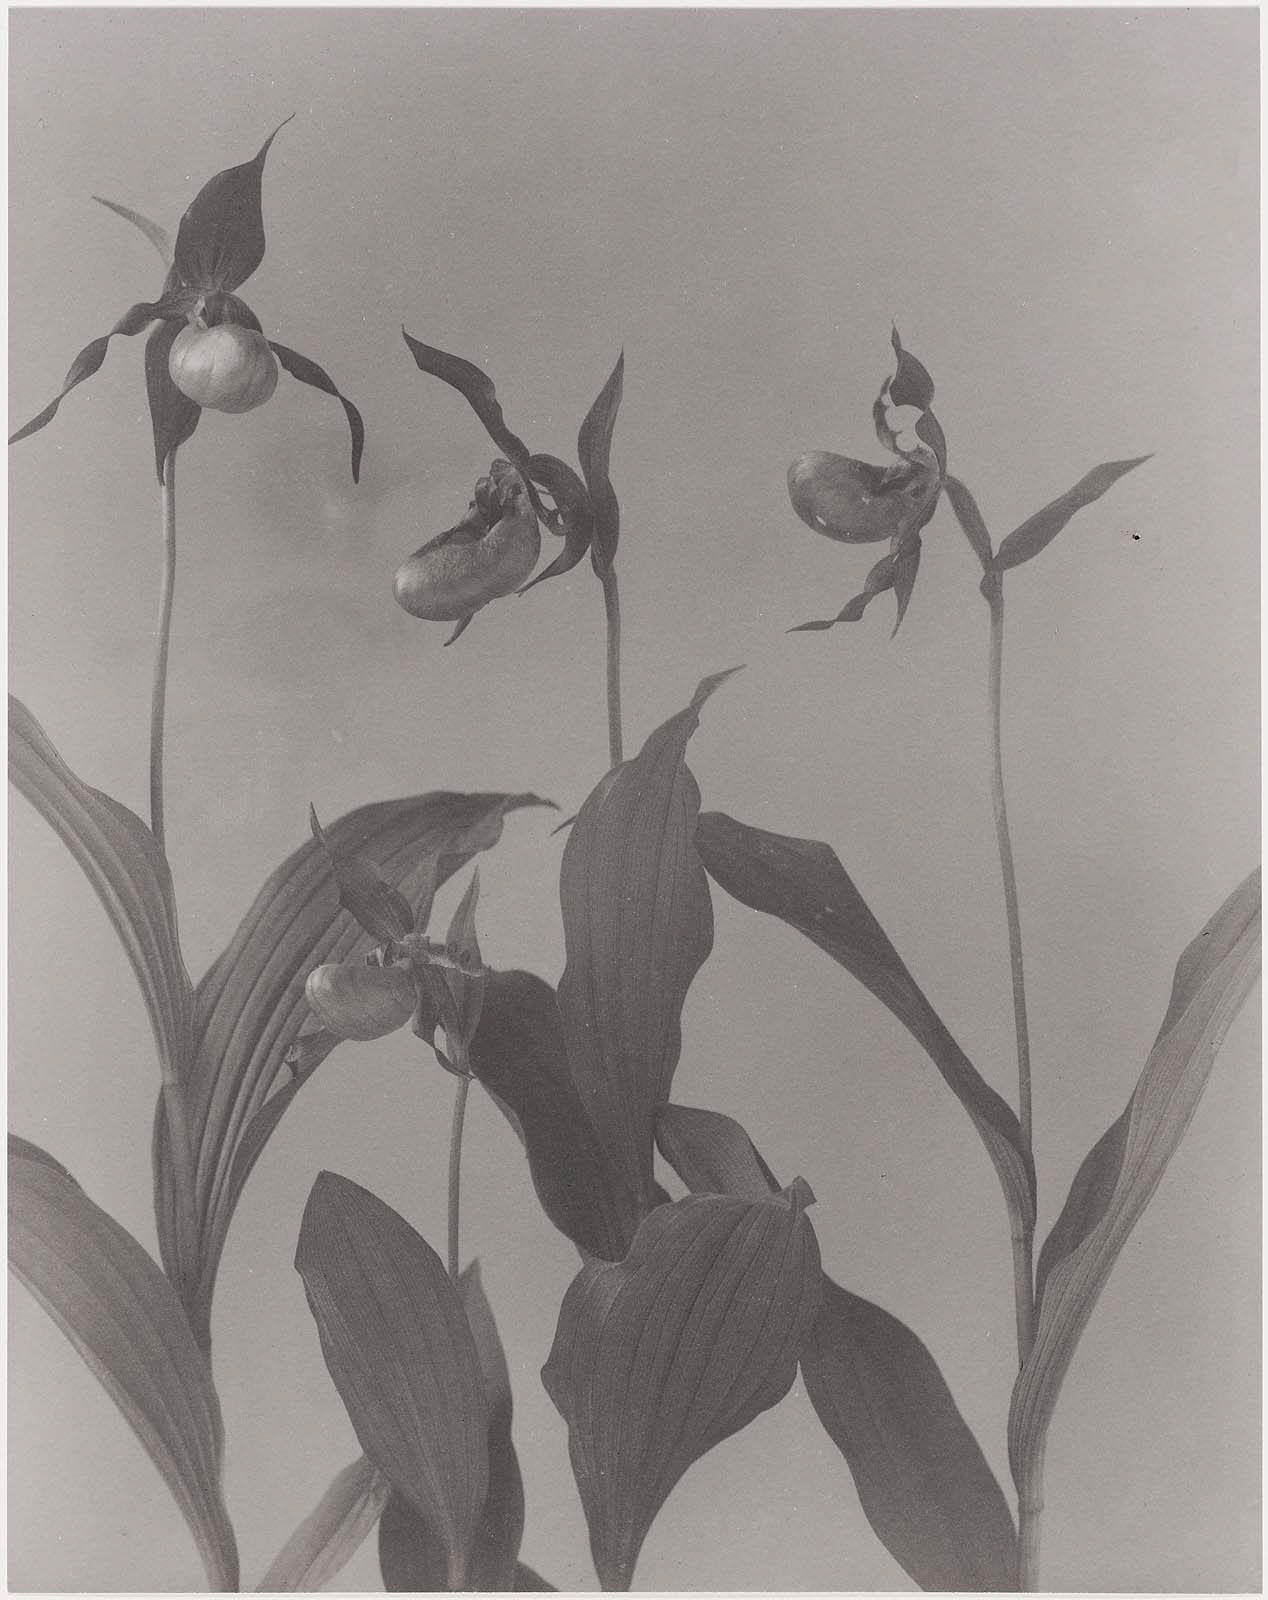 Cypripedium Parviflorum Small Yellow Ladys Slipper From Wild